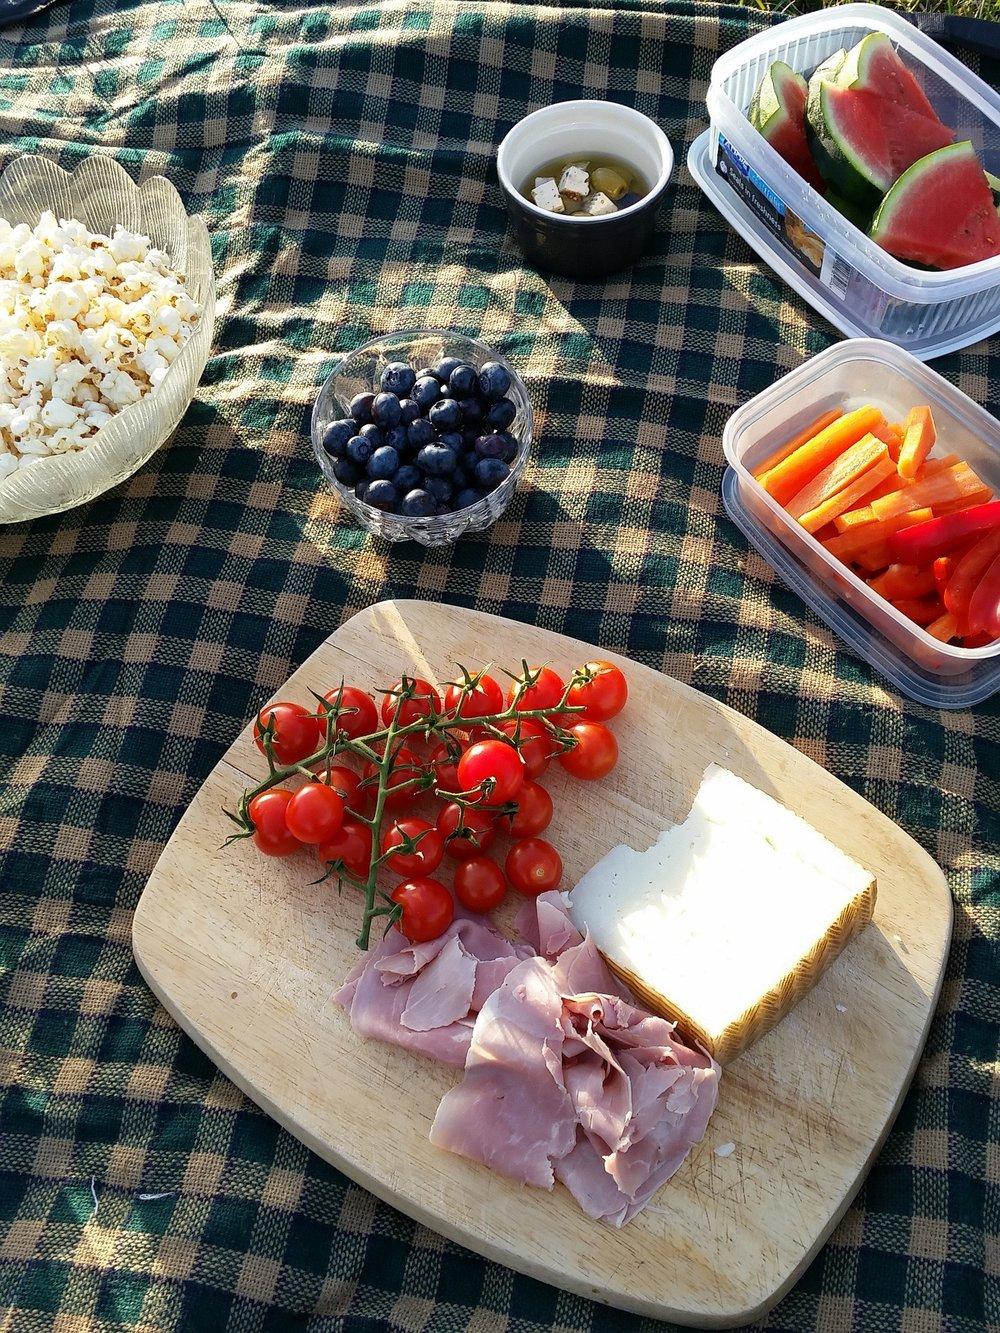 picnic-888398_1920.jpg